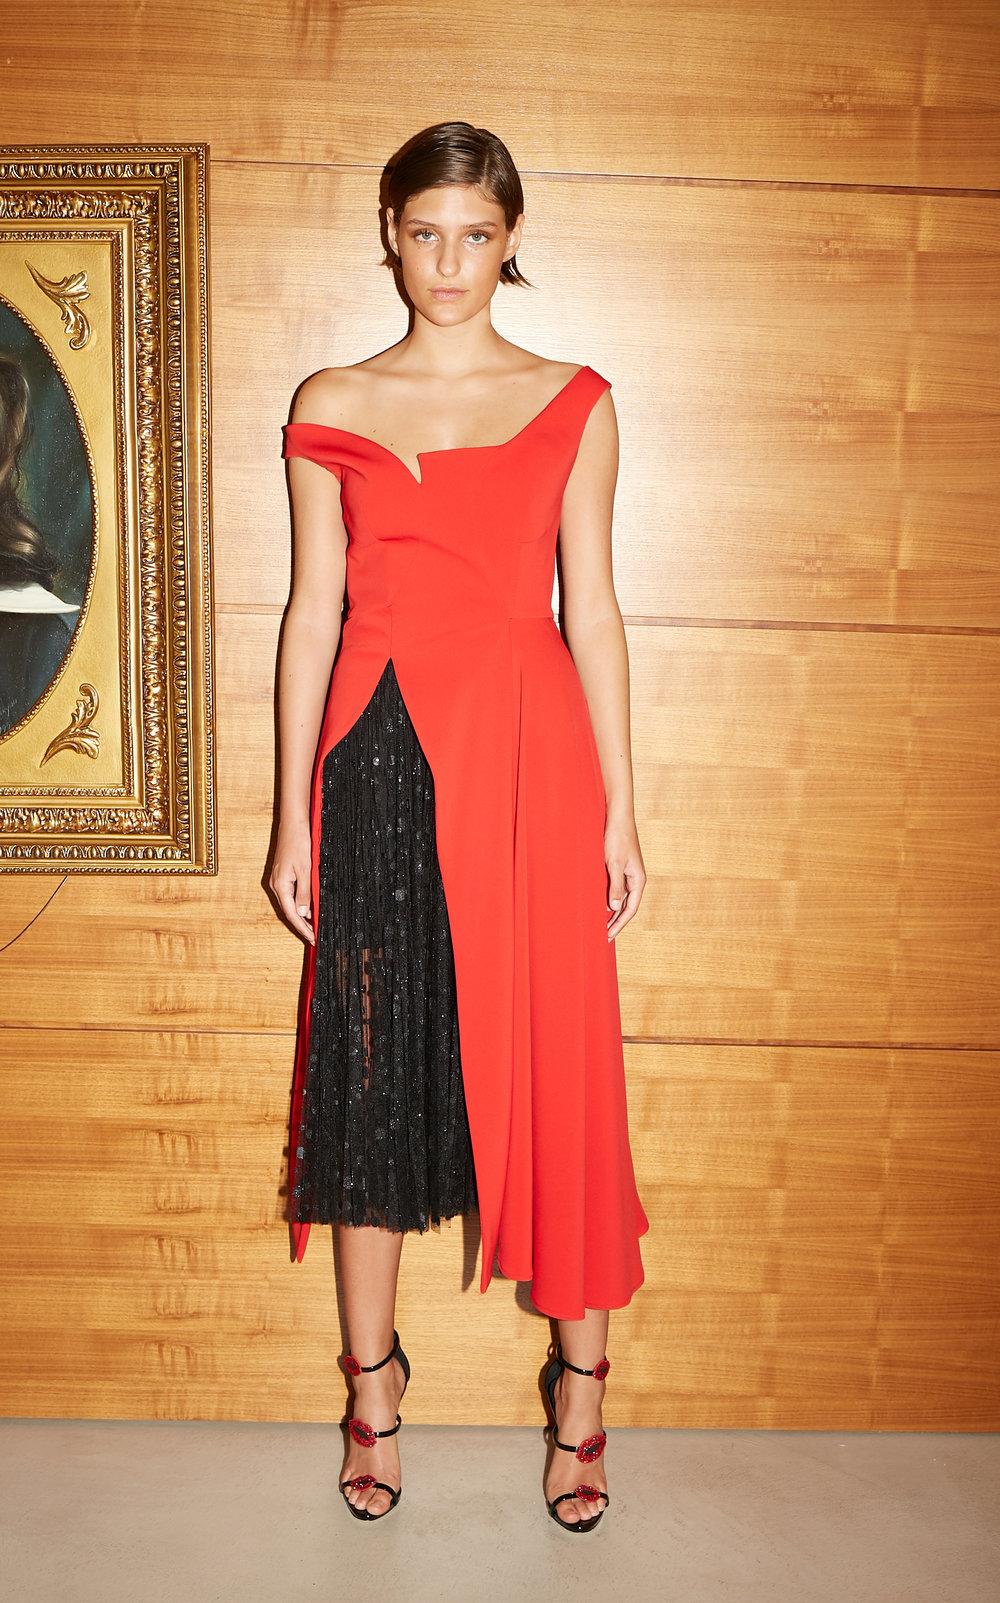 Model stands in sleeveless red tea length dress with asymmetric neckline and off centered slit revealing black sparkling tulle under skirt